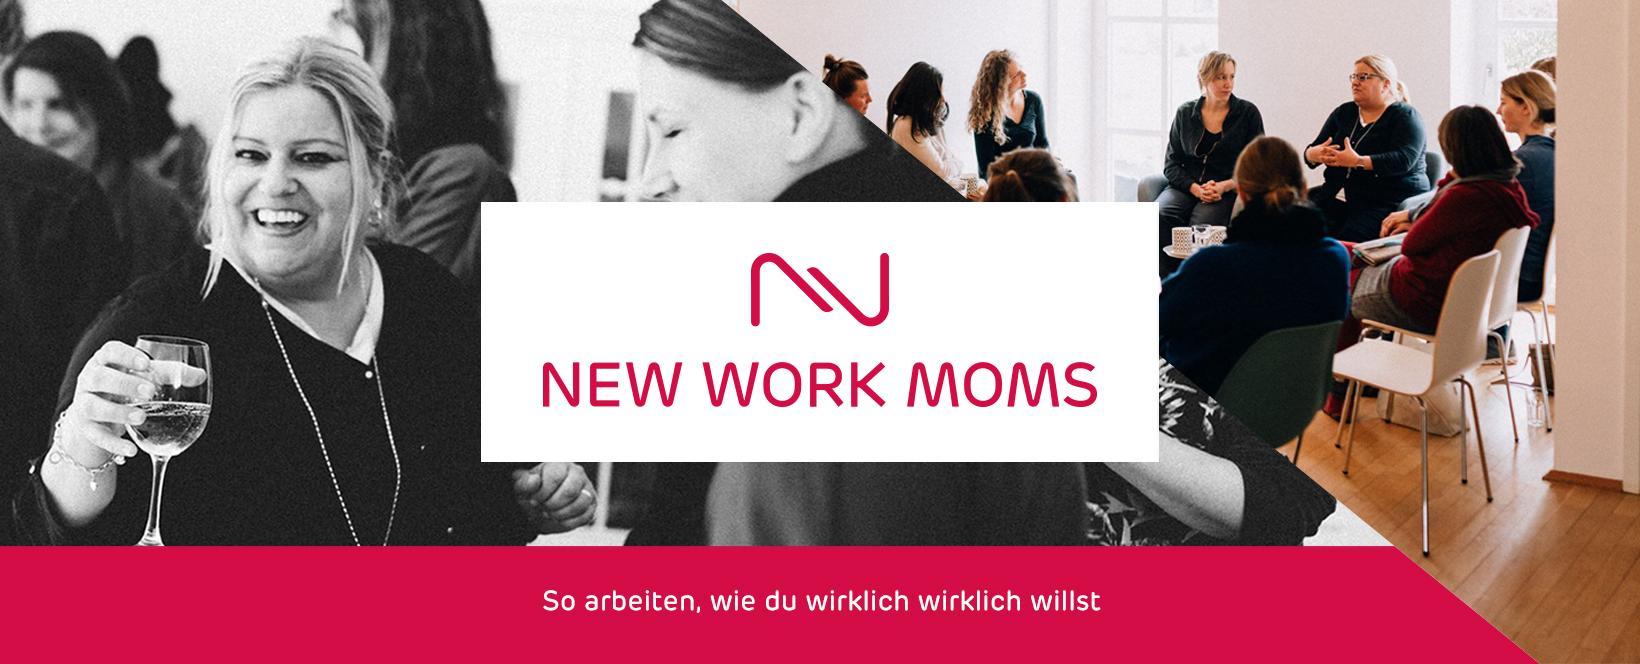 New Work Moms Köln Meetup 3. April 2020